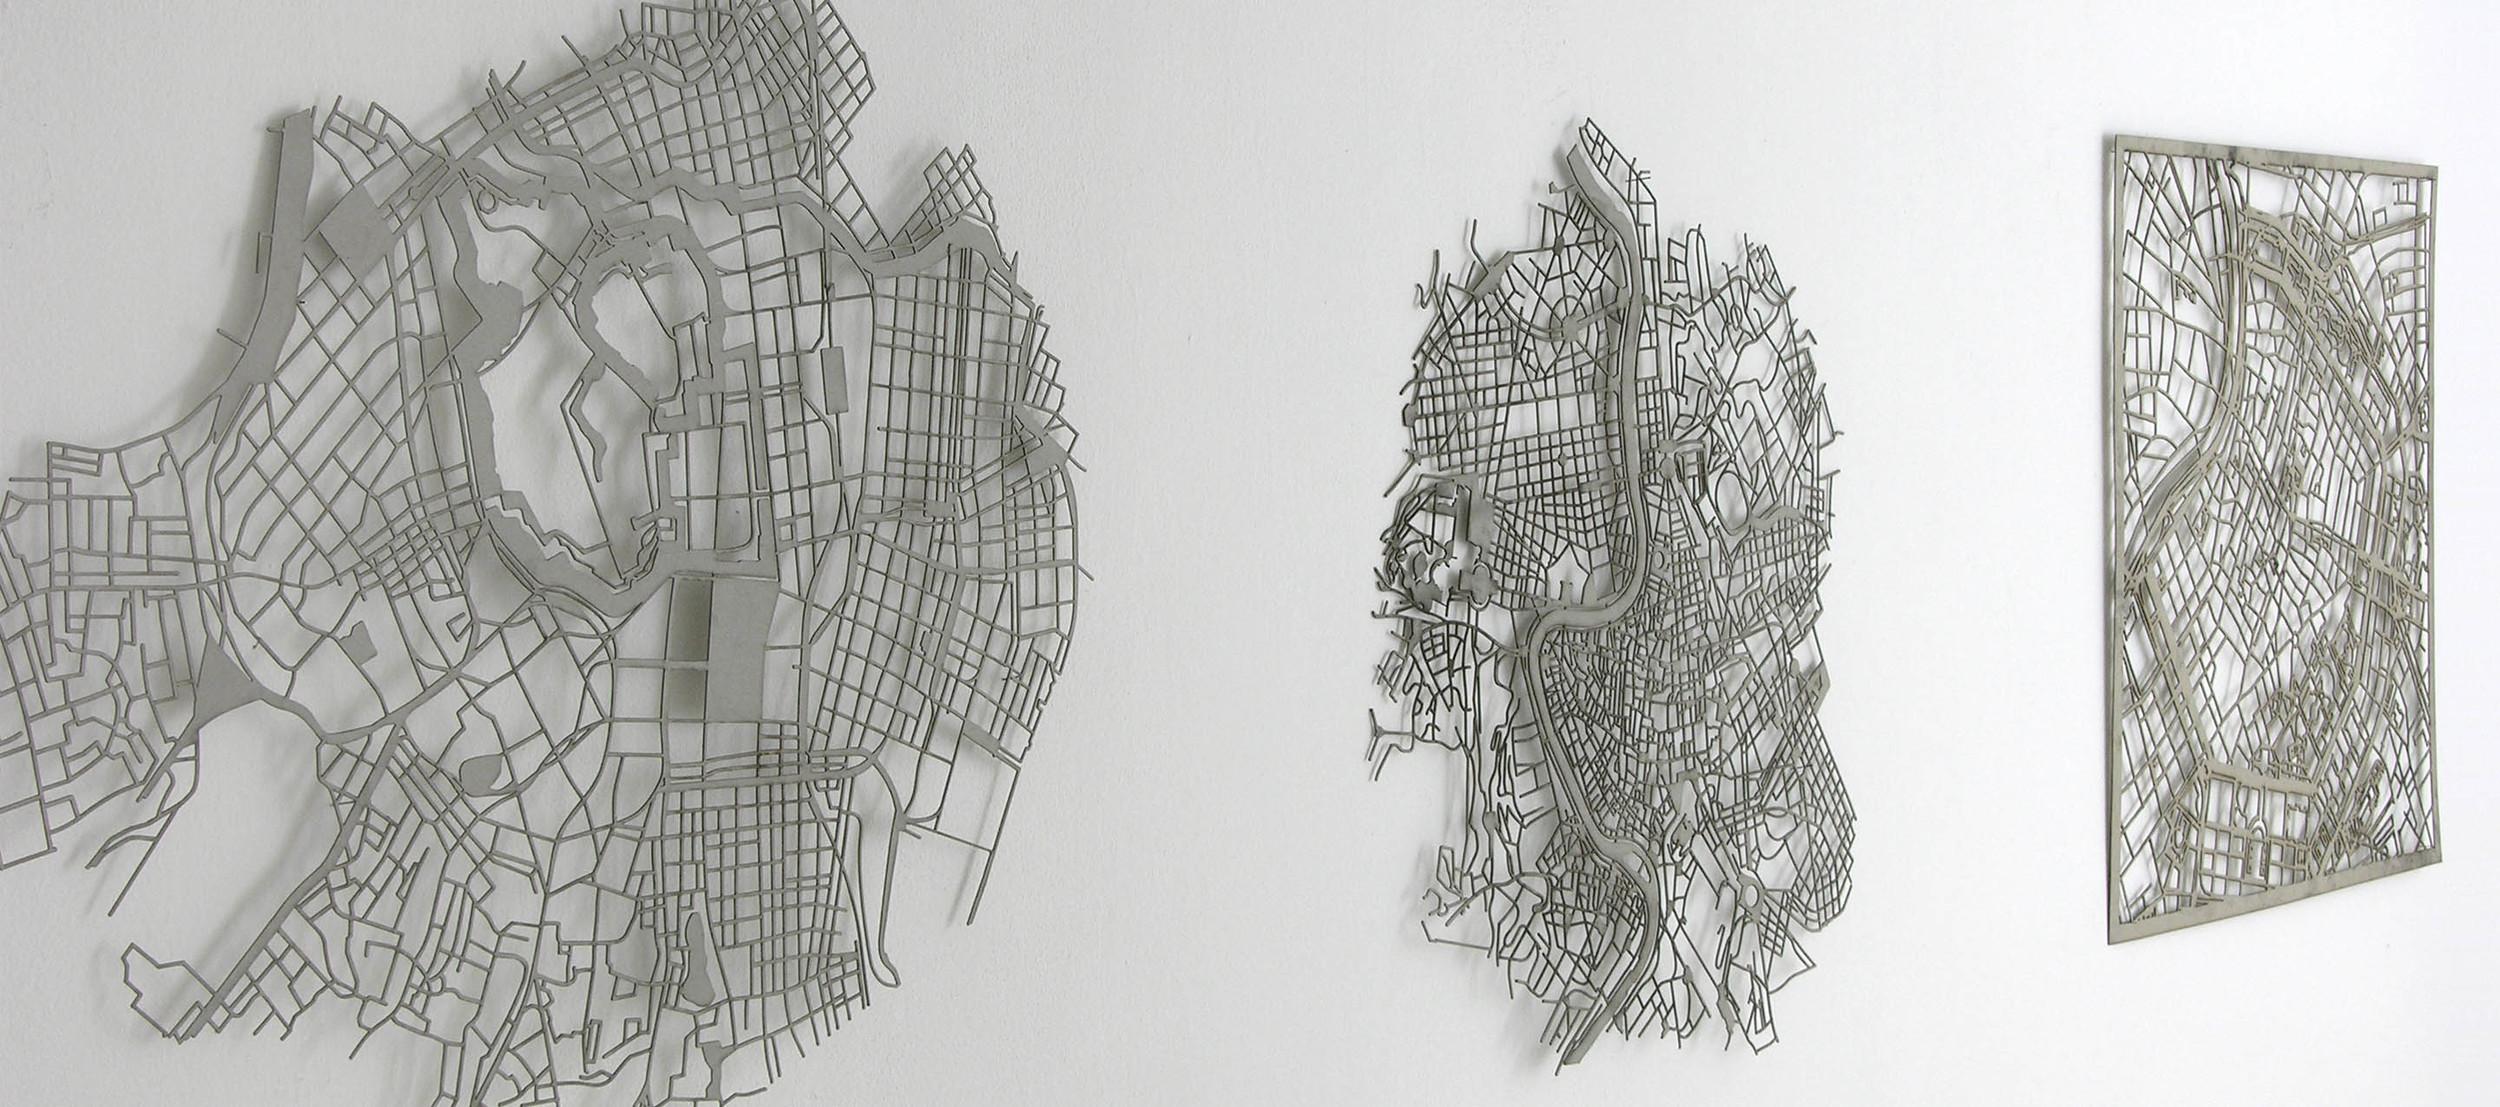 urban_gridded_ehibit_9207_p.jpg